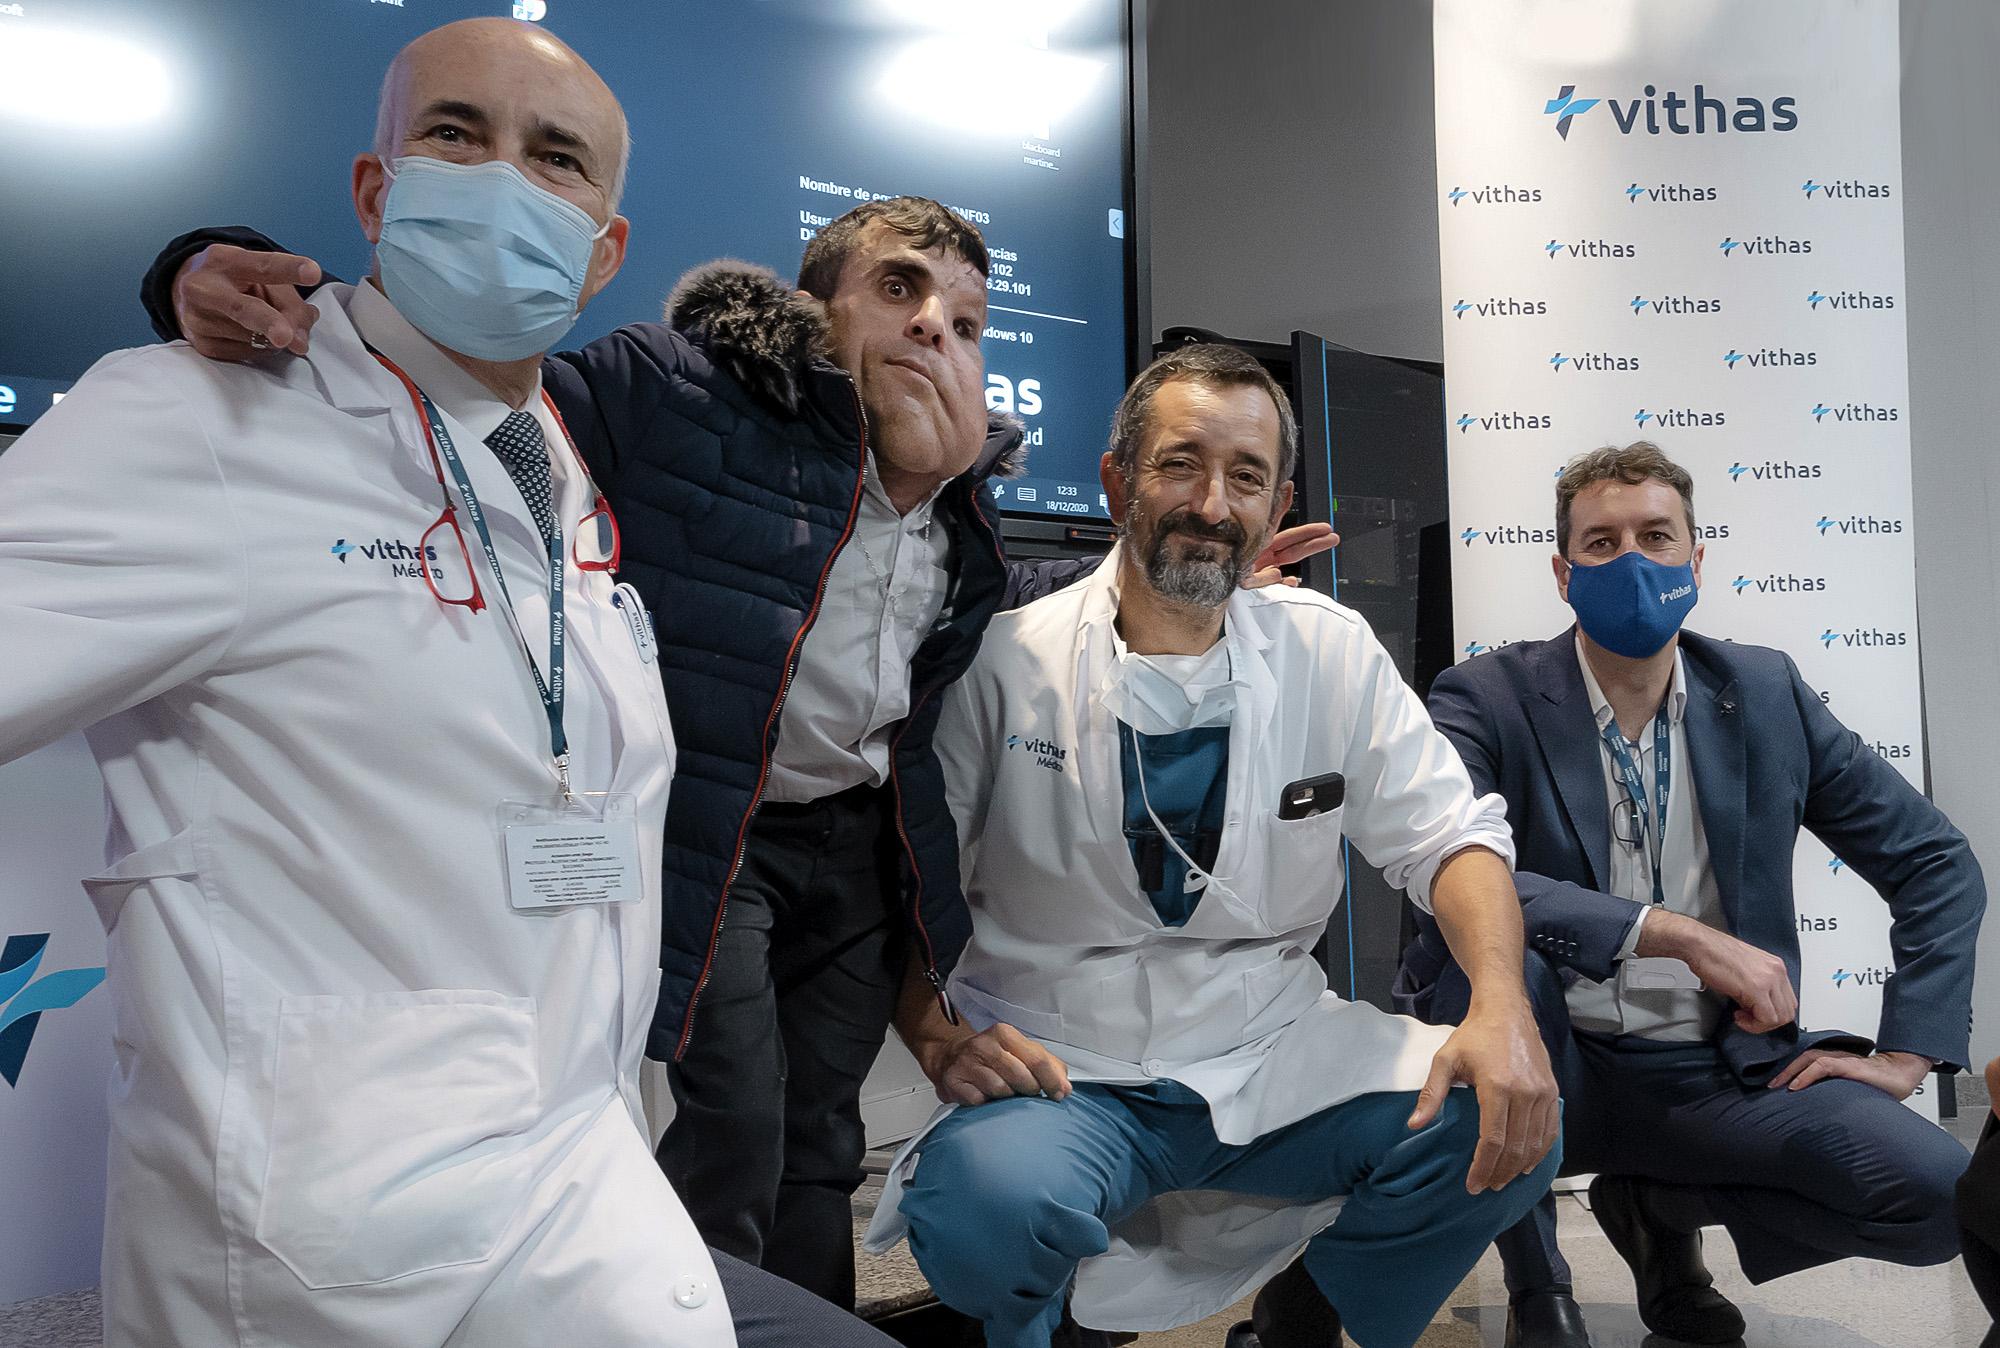 Surgeon Removes 29-Pound Tumor to Give Man New Life